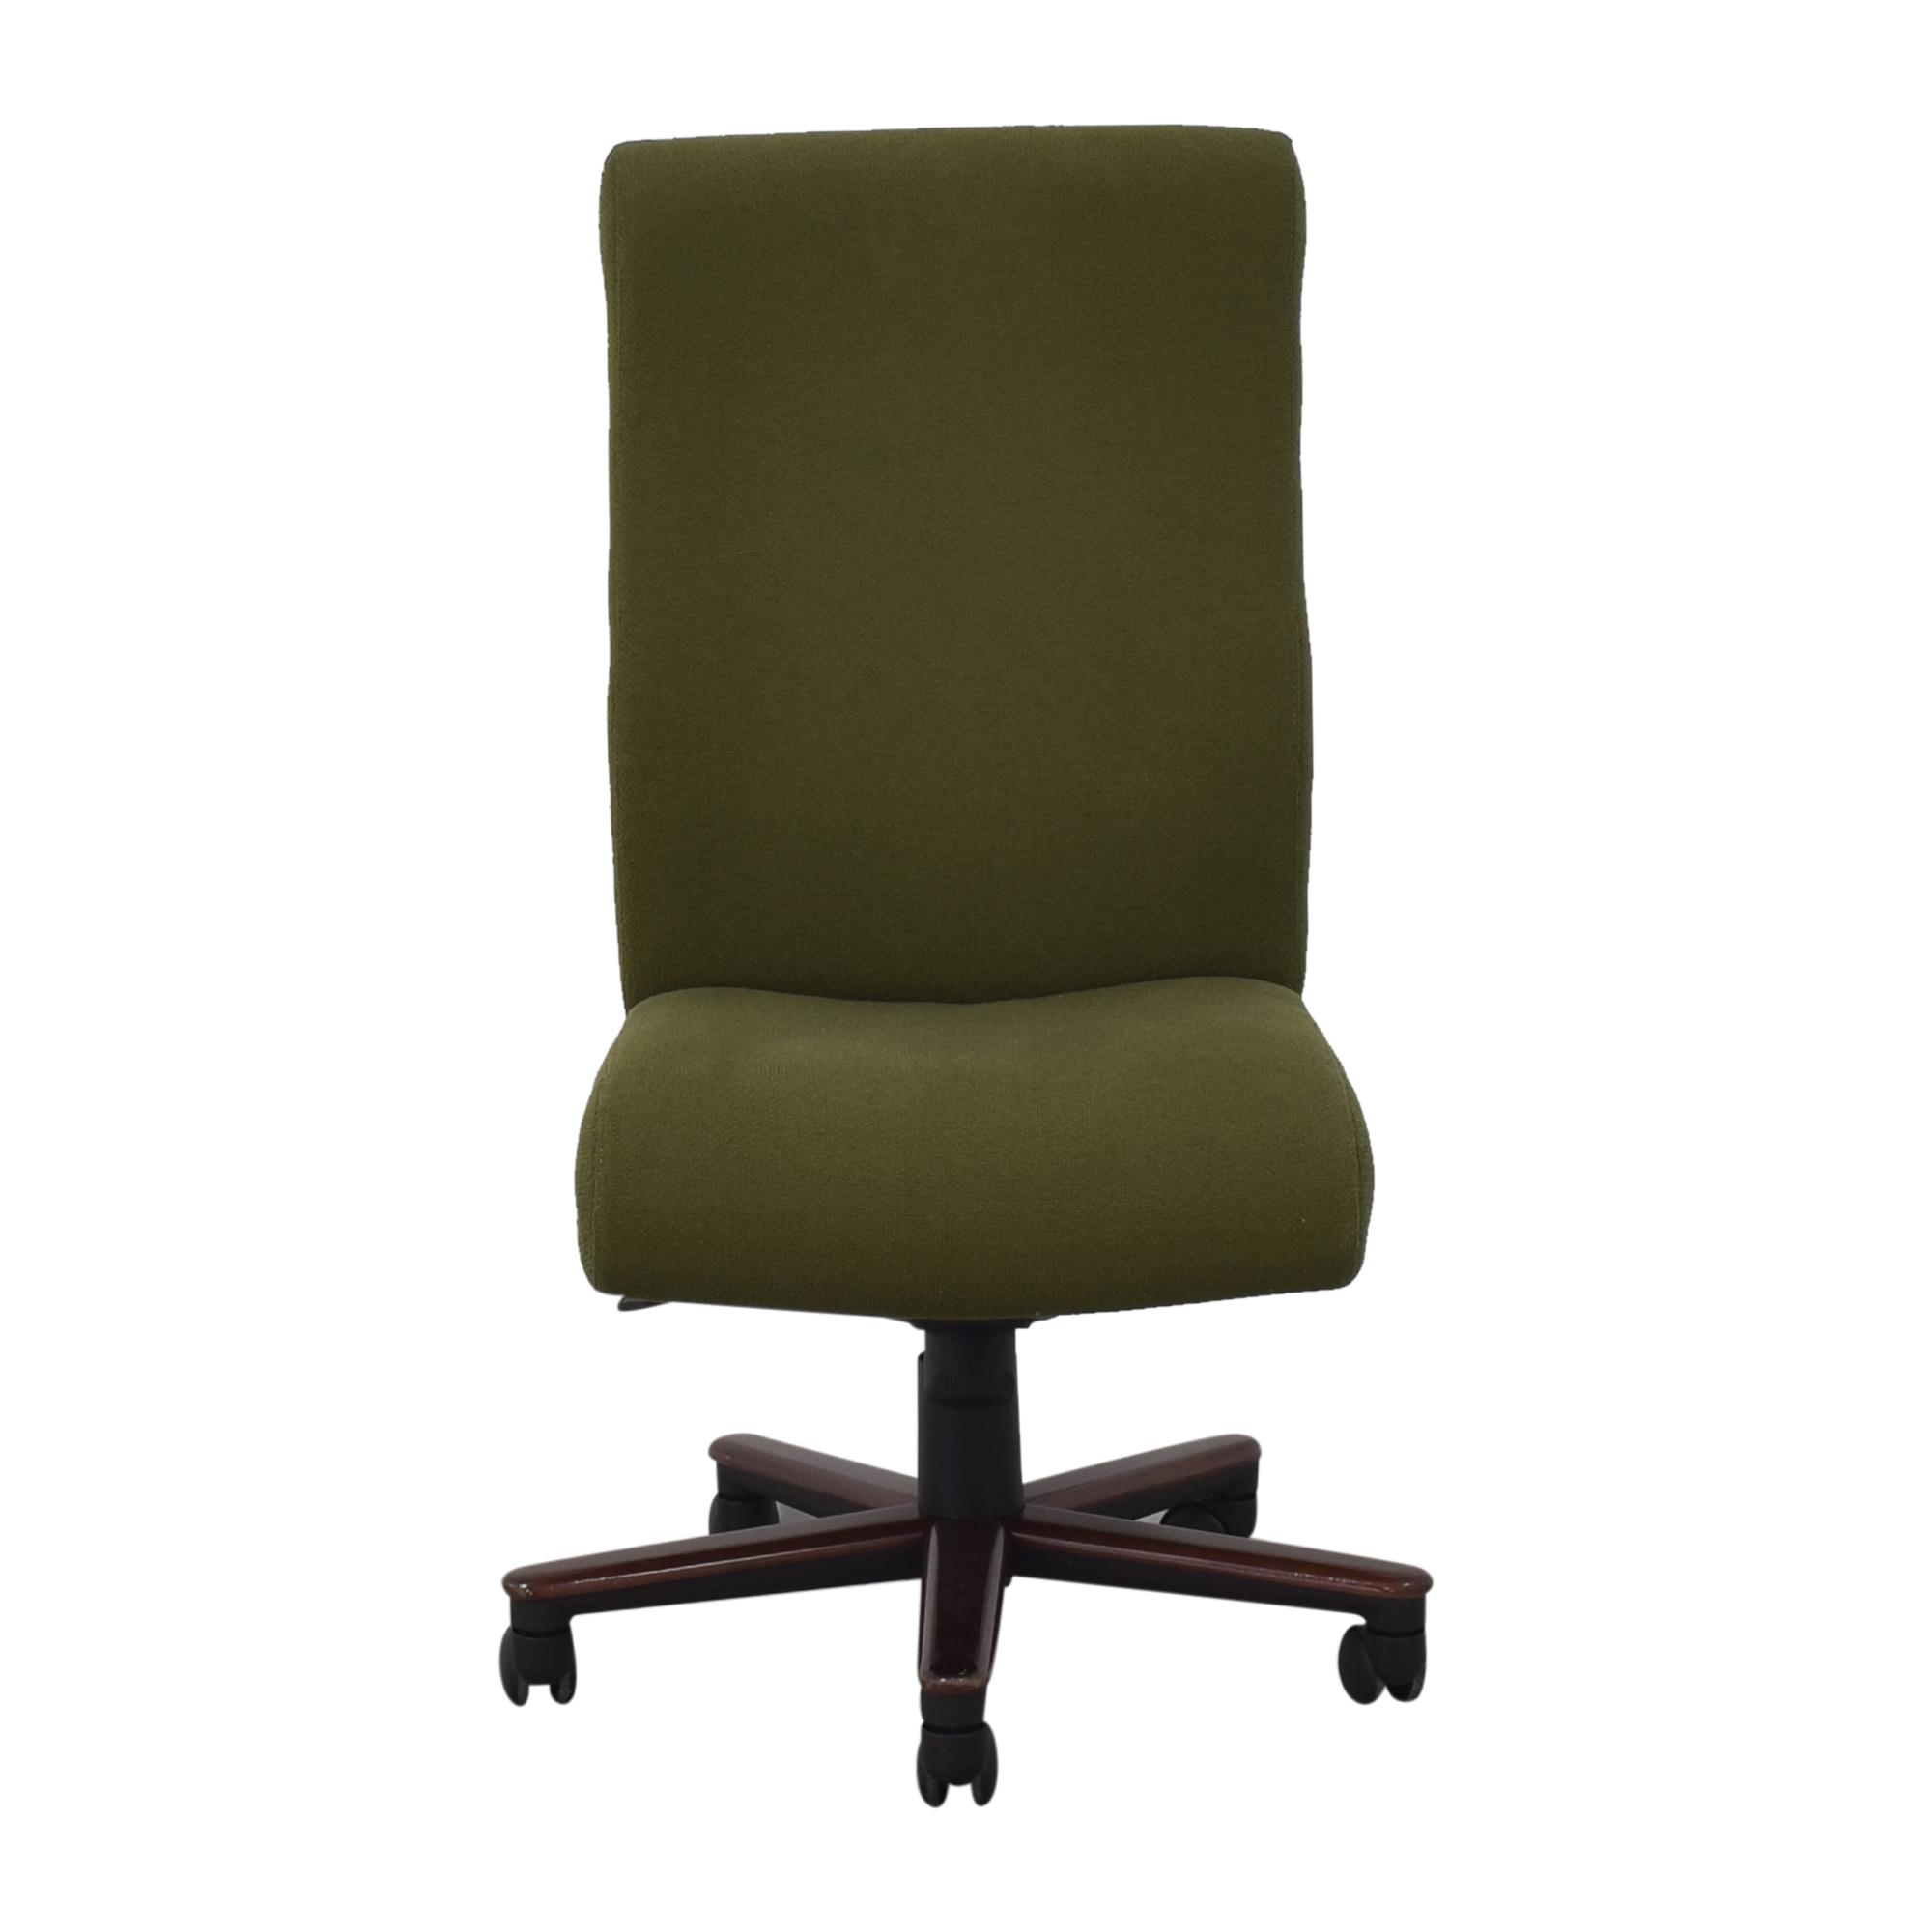 shop Jack Cartwright Jack Cartwright Swivel Desk Chair online